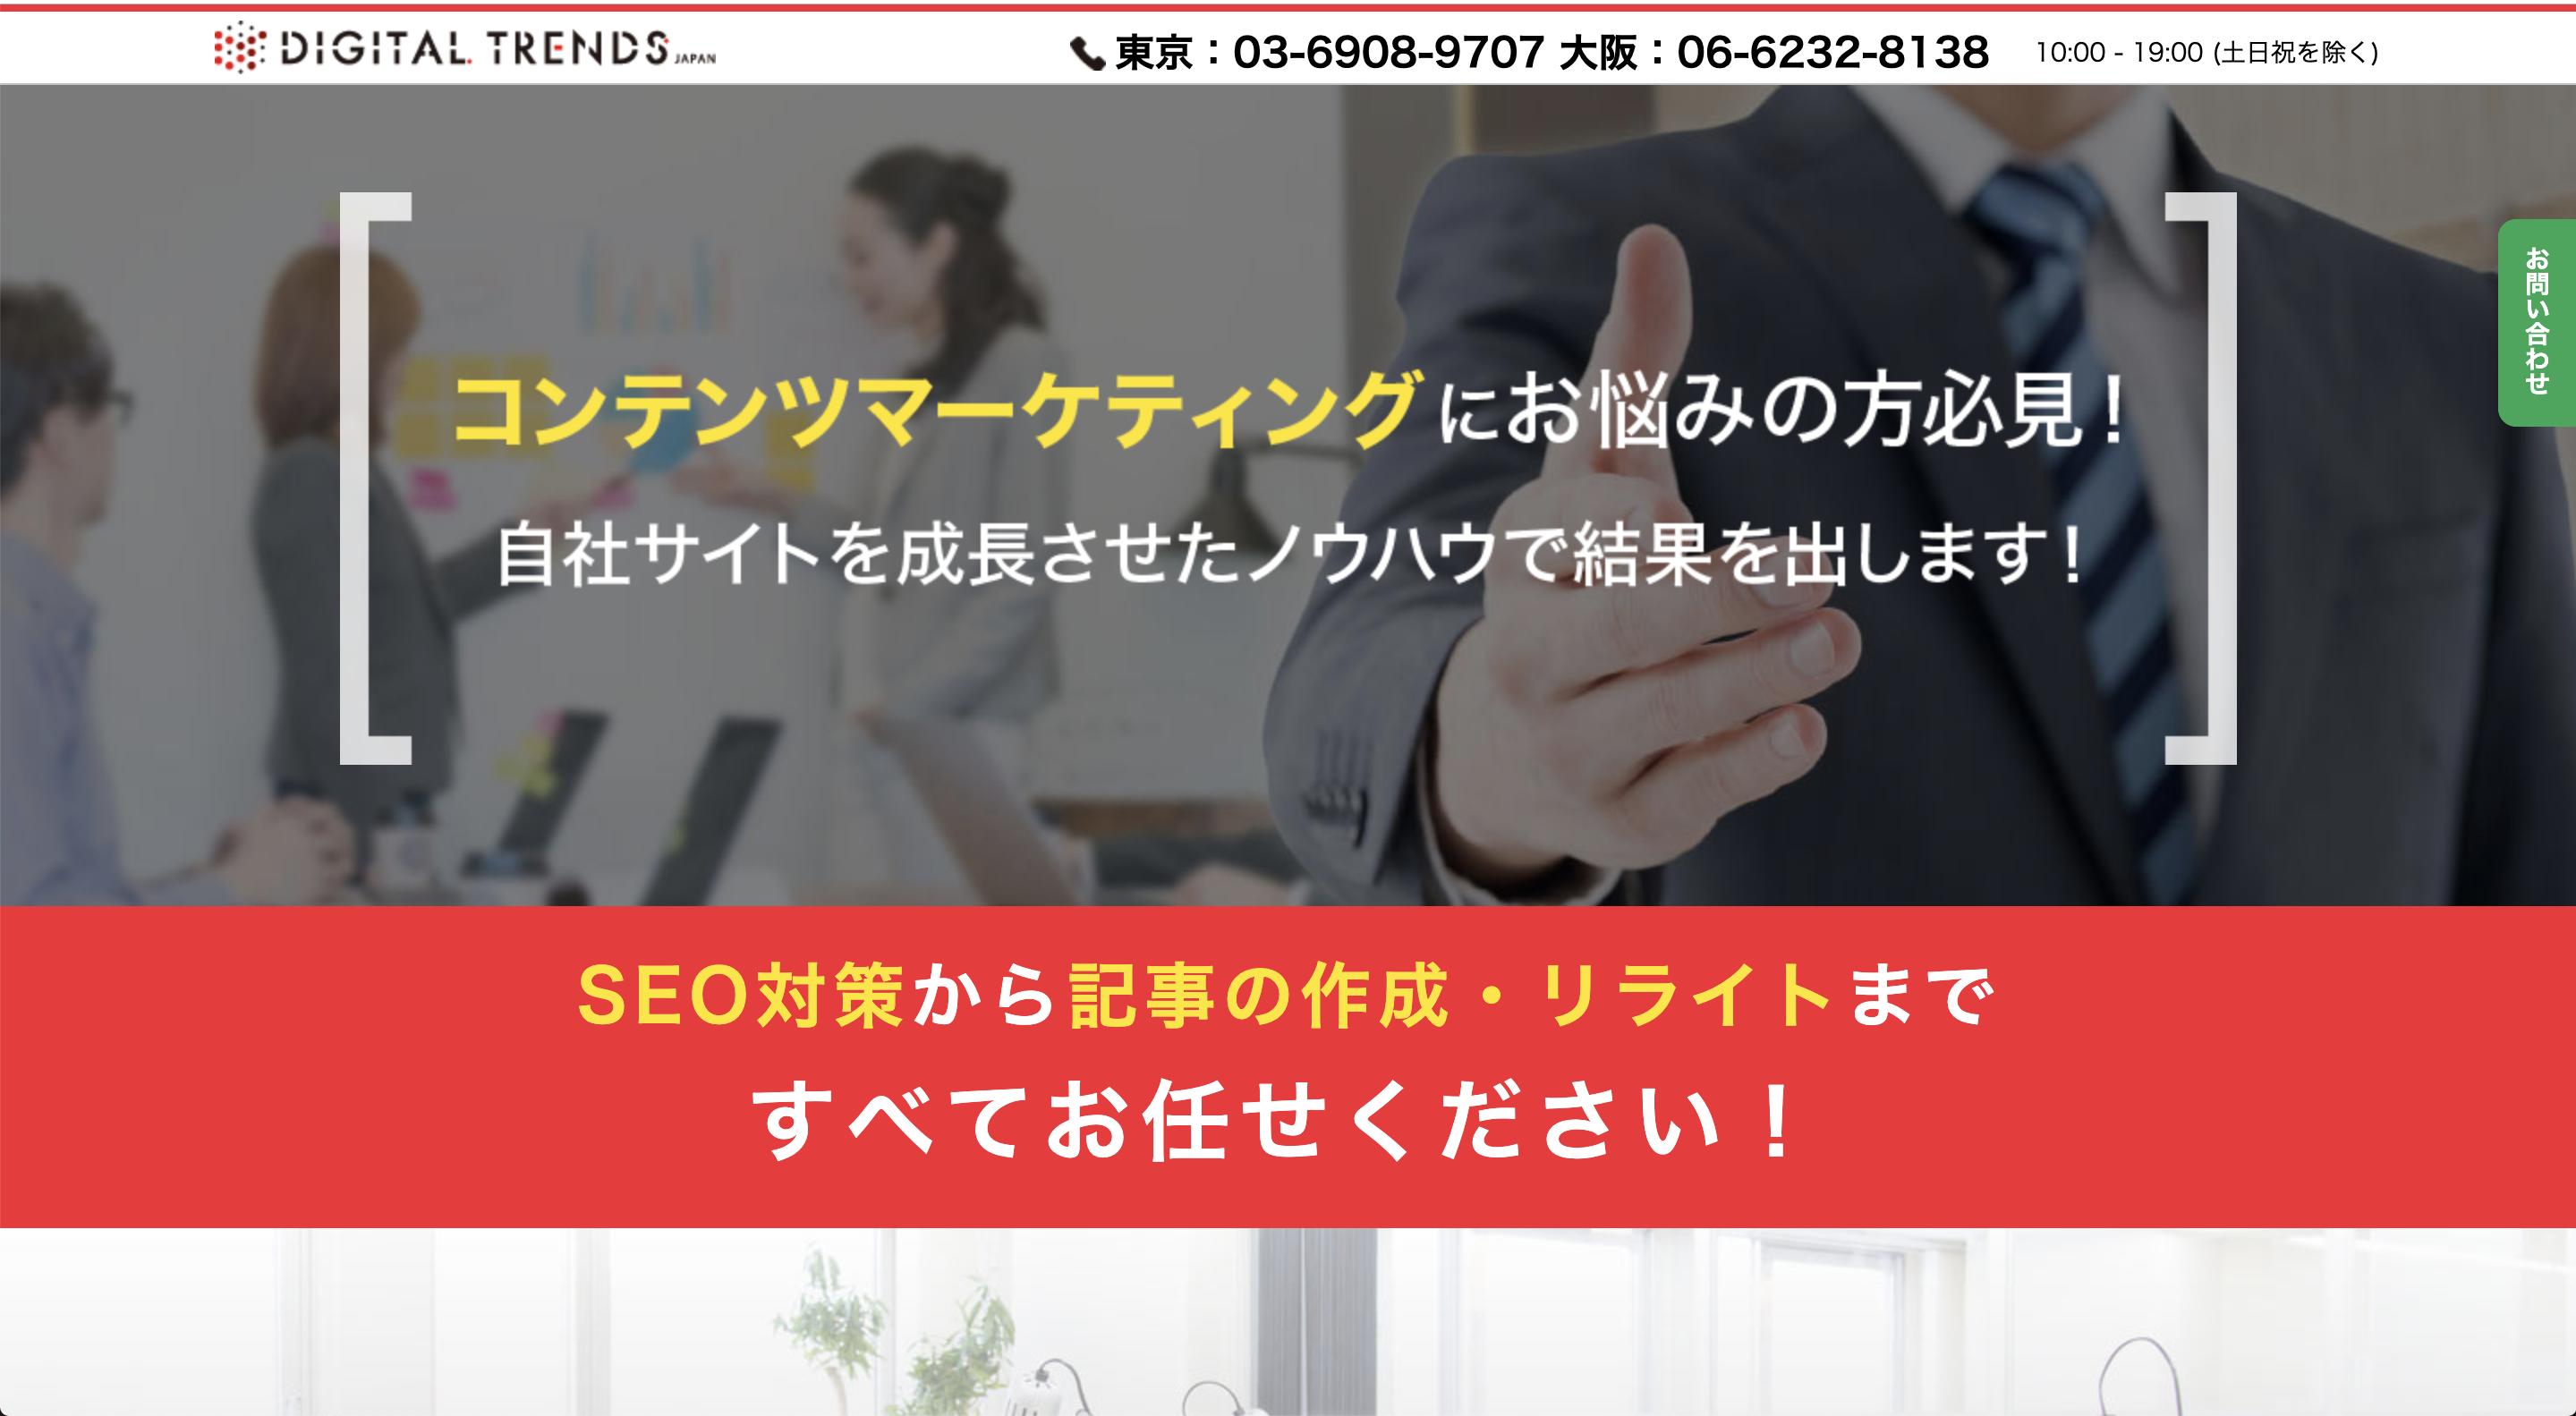 SEOに強いコンテンツマーケティング代行|株式会社デジタルトレンズ